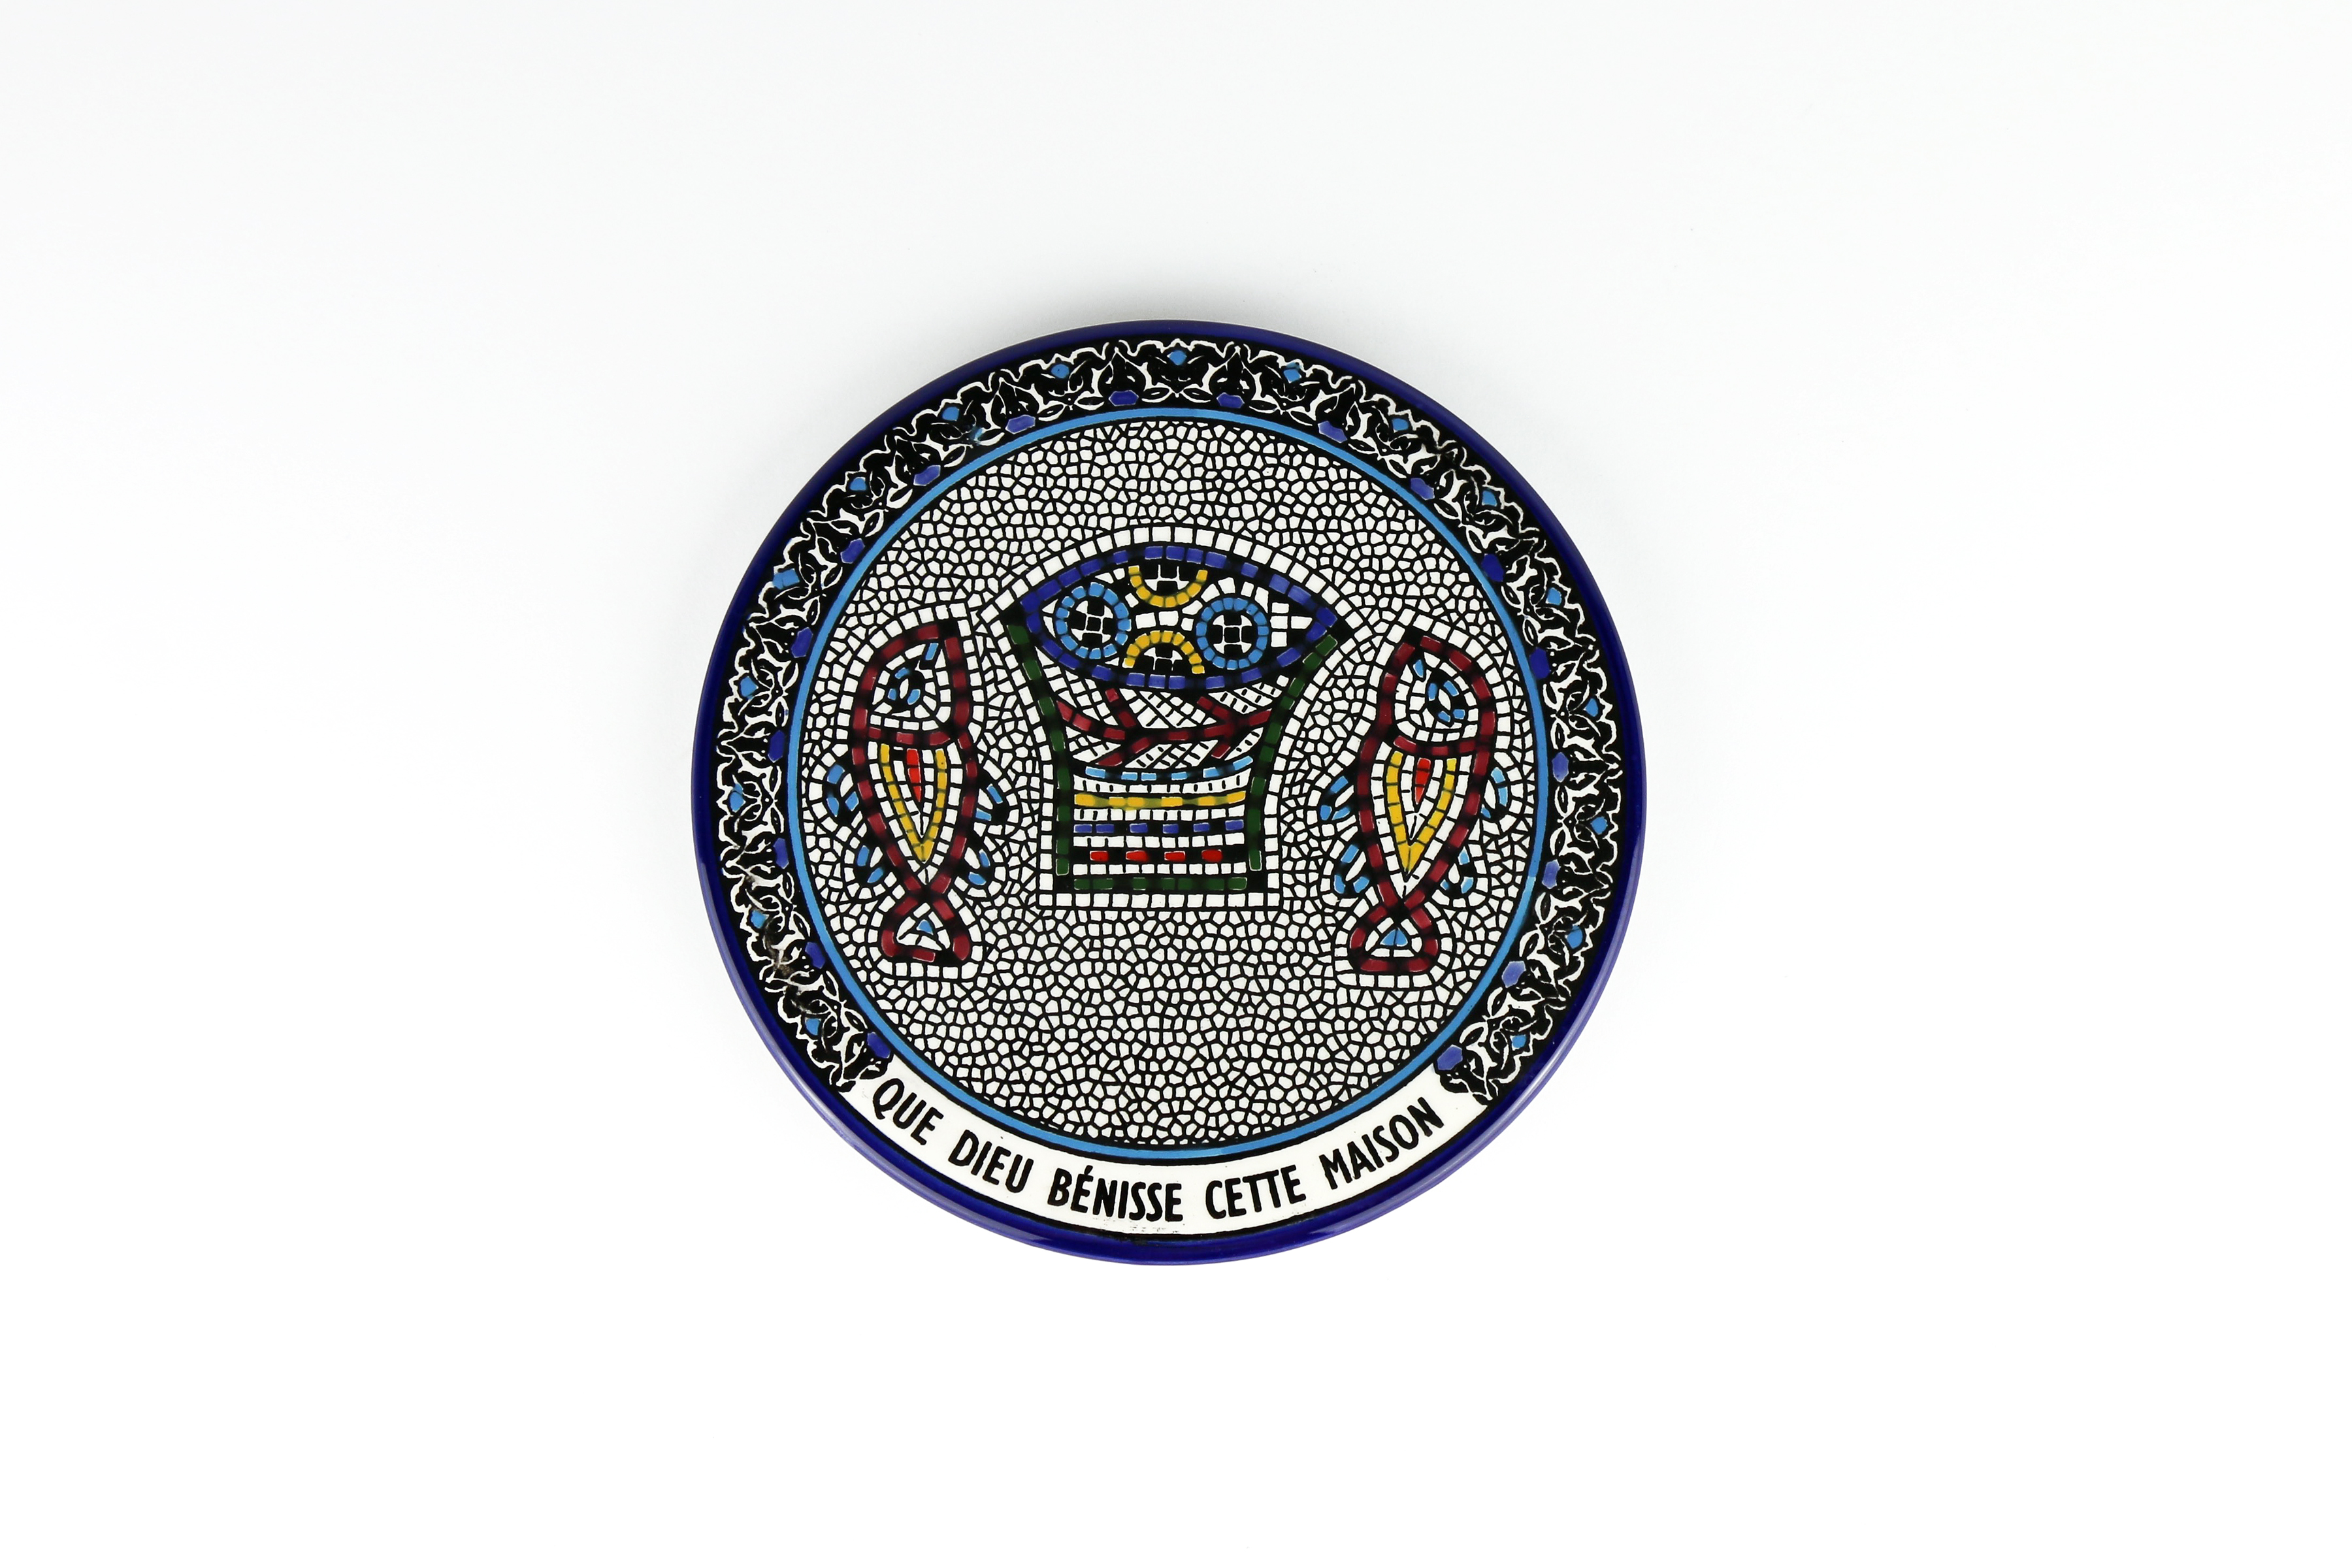 Patène / Ceramic Paten